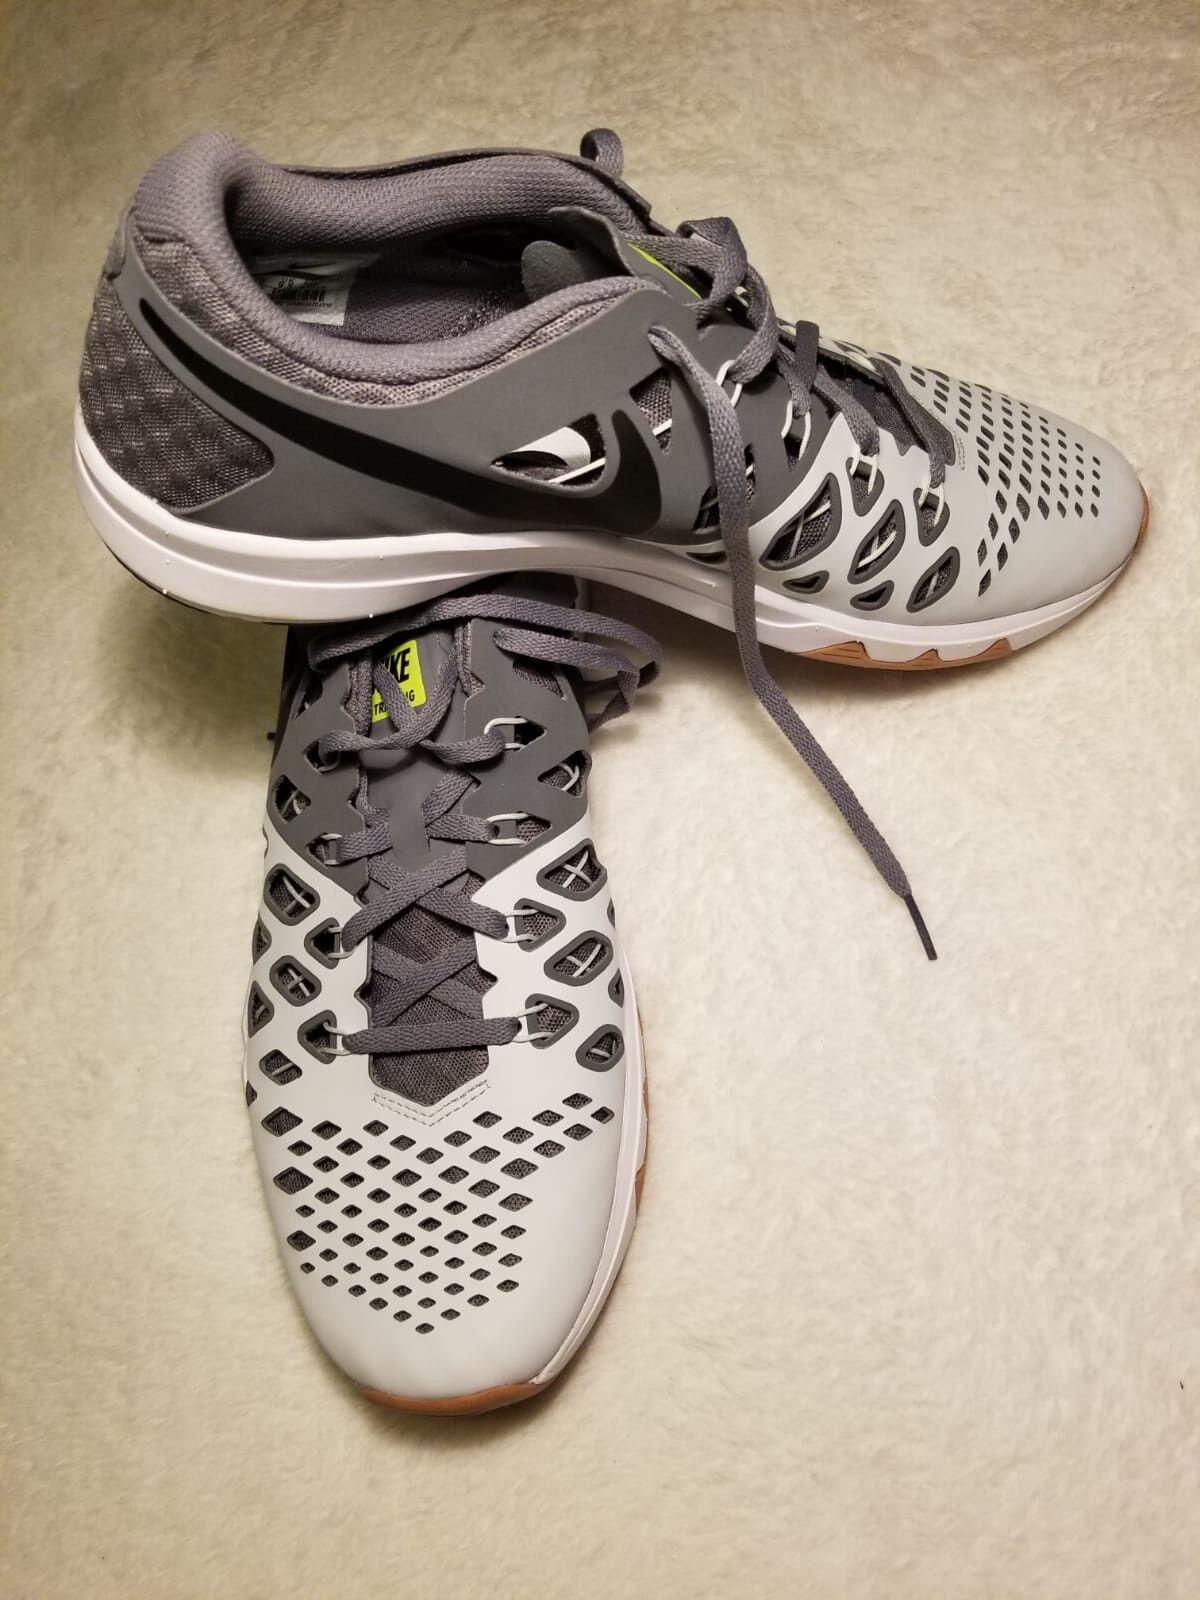 Nike Train Speed 4 Pure Platinum Grey 843937-005 Training Shoes Men's  Size 10